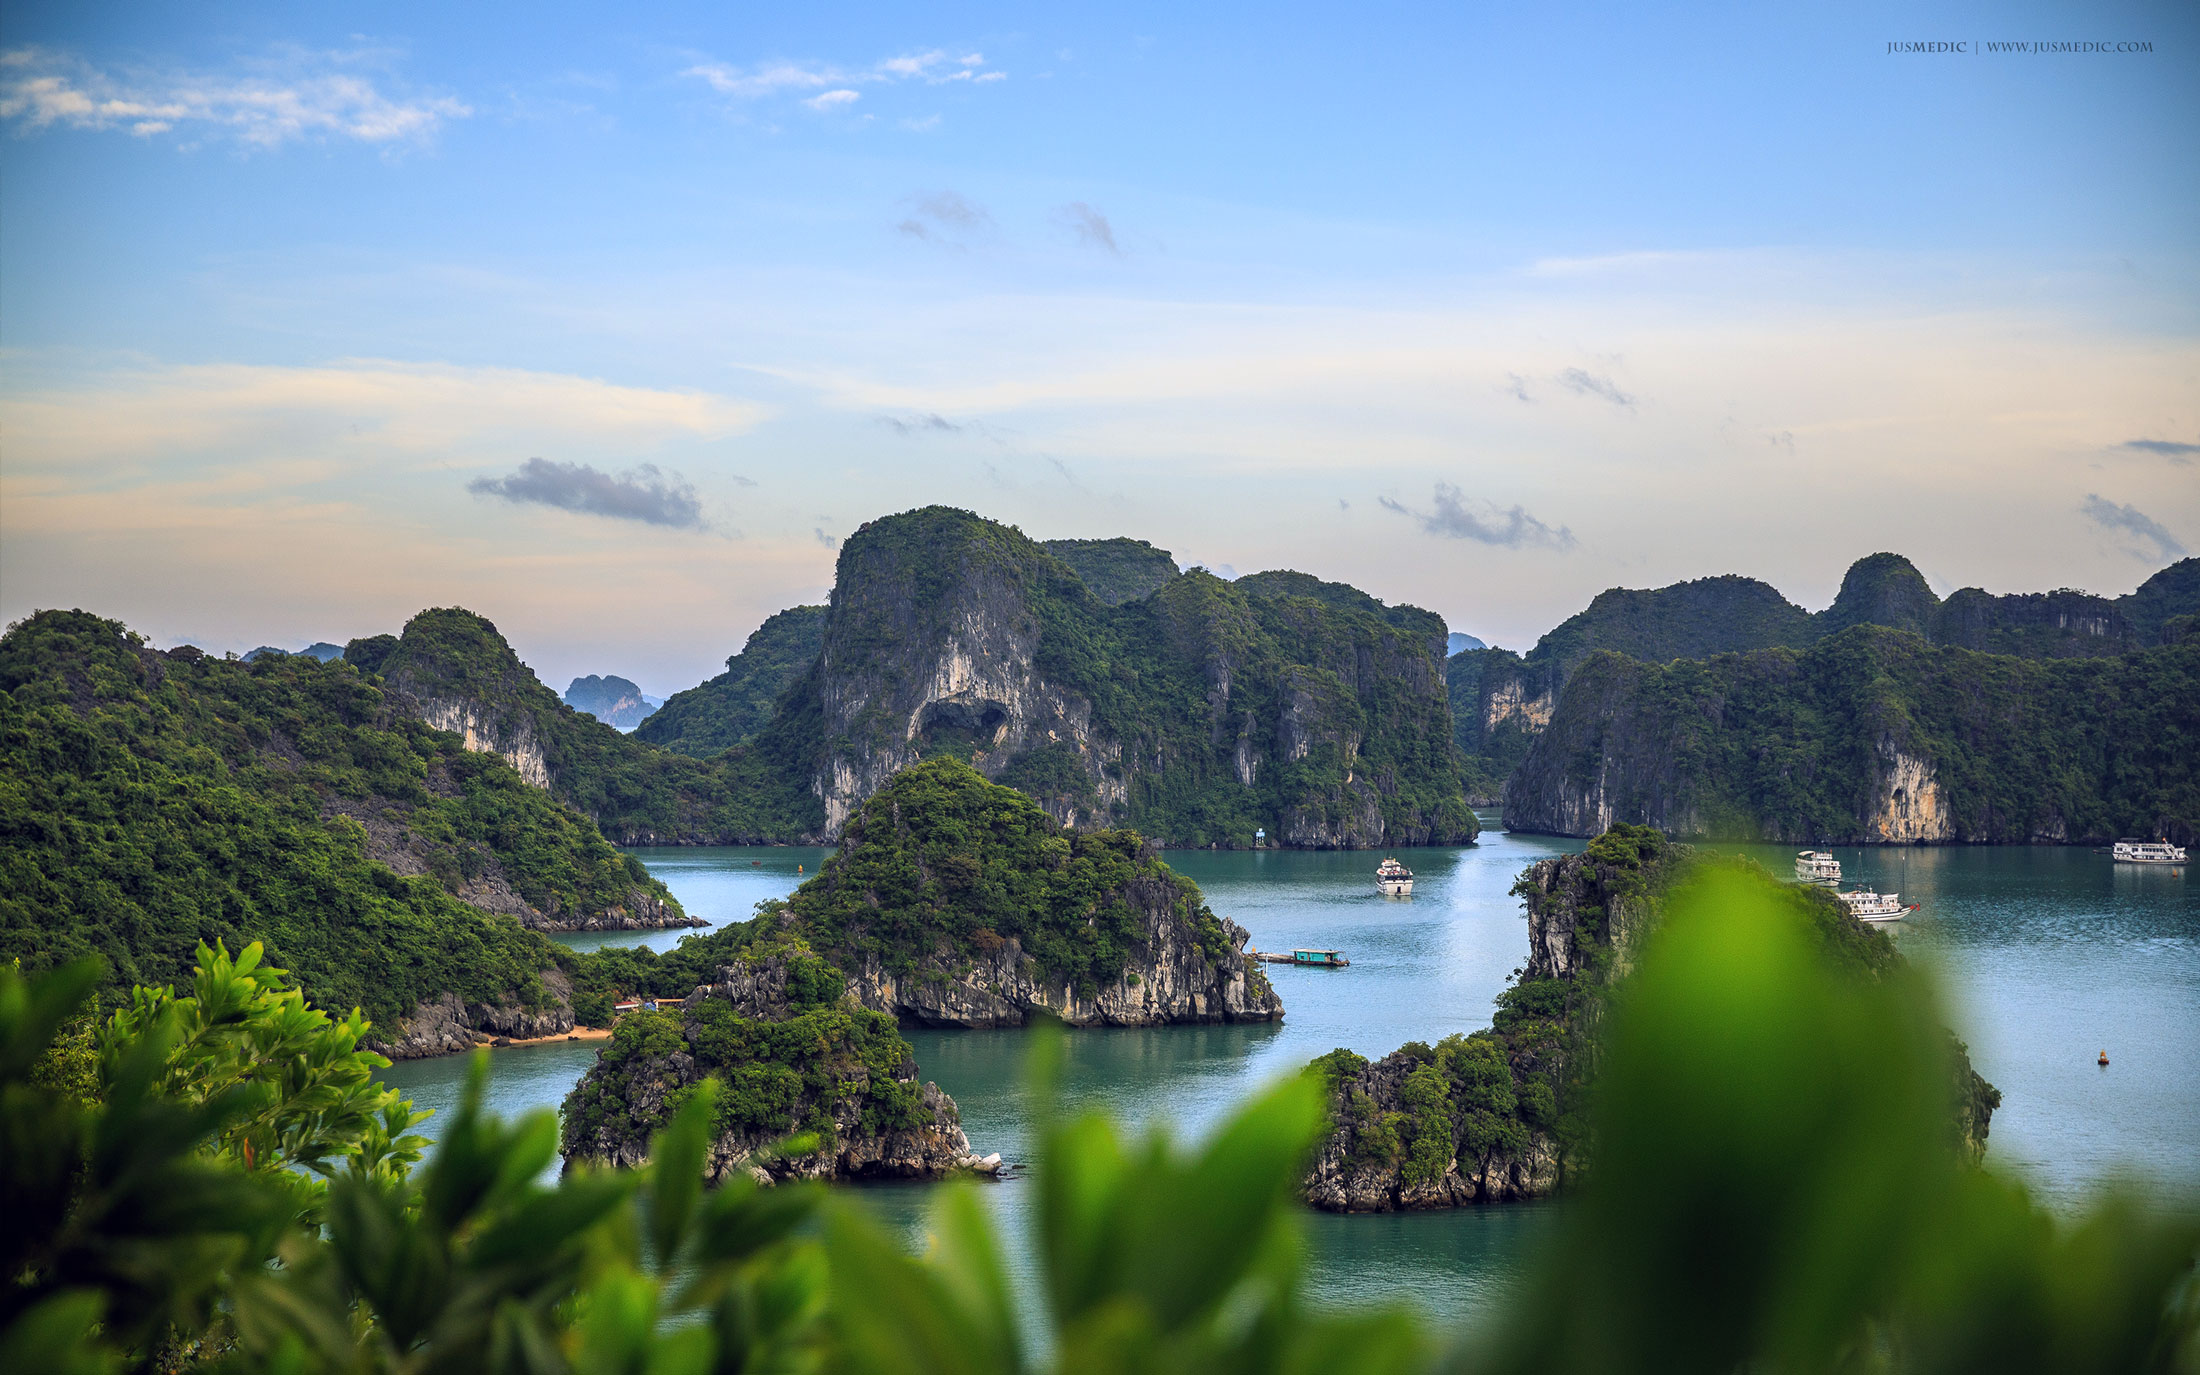 Halong Bay, Vietnam - www.jusmedic.com